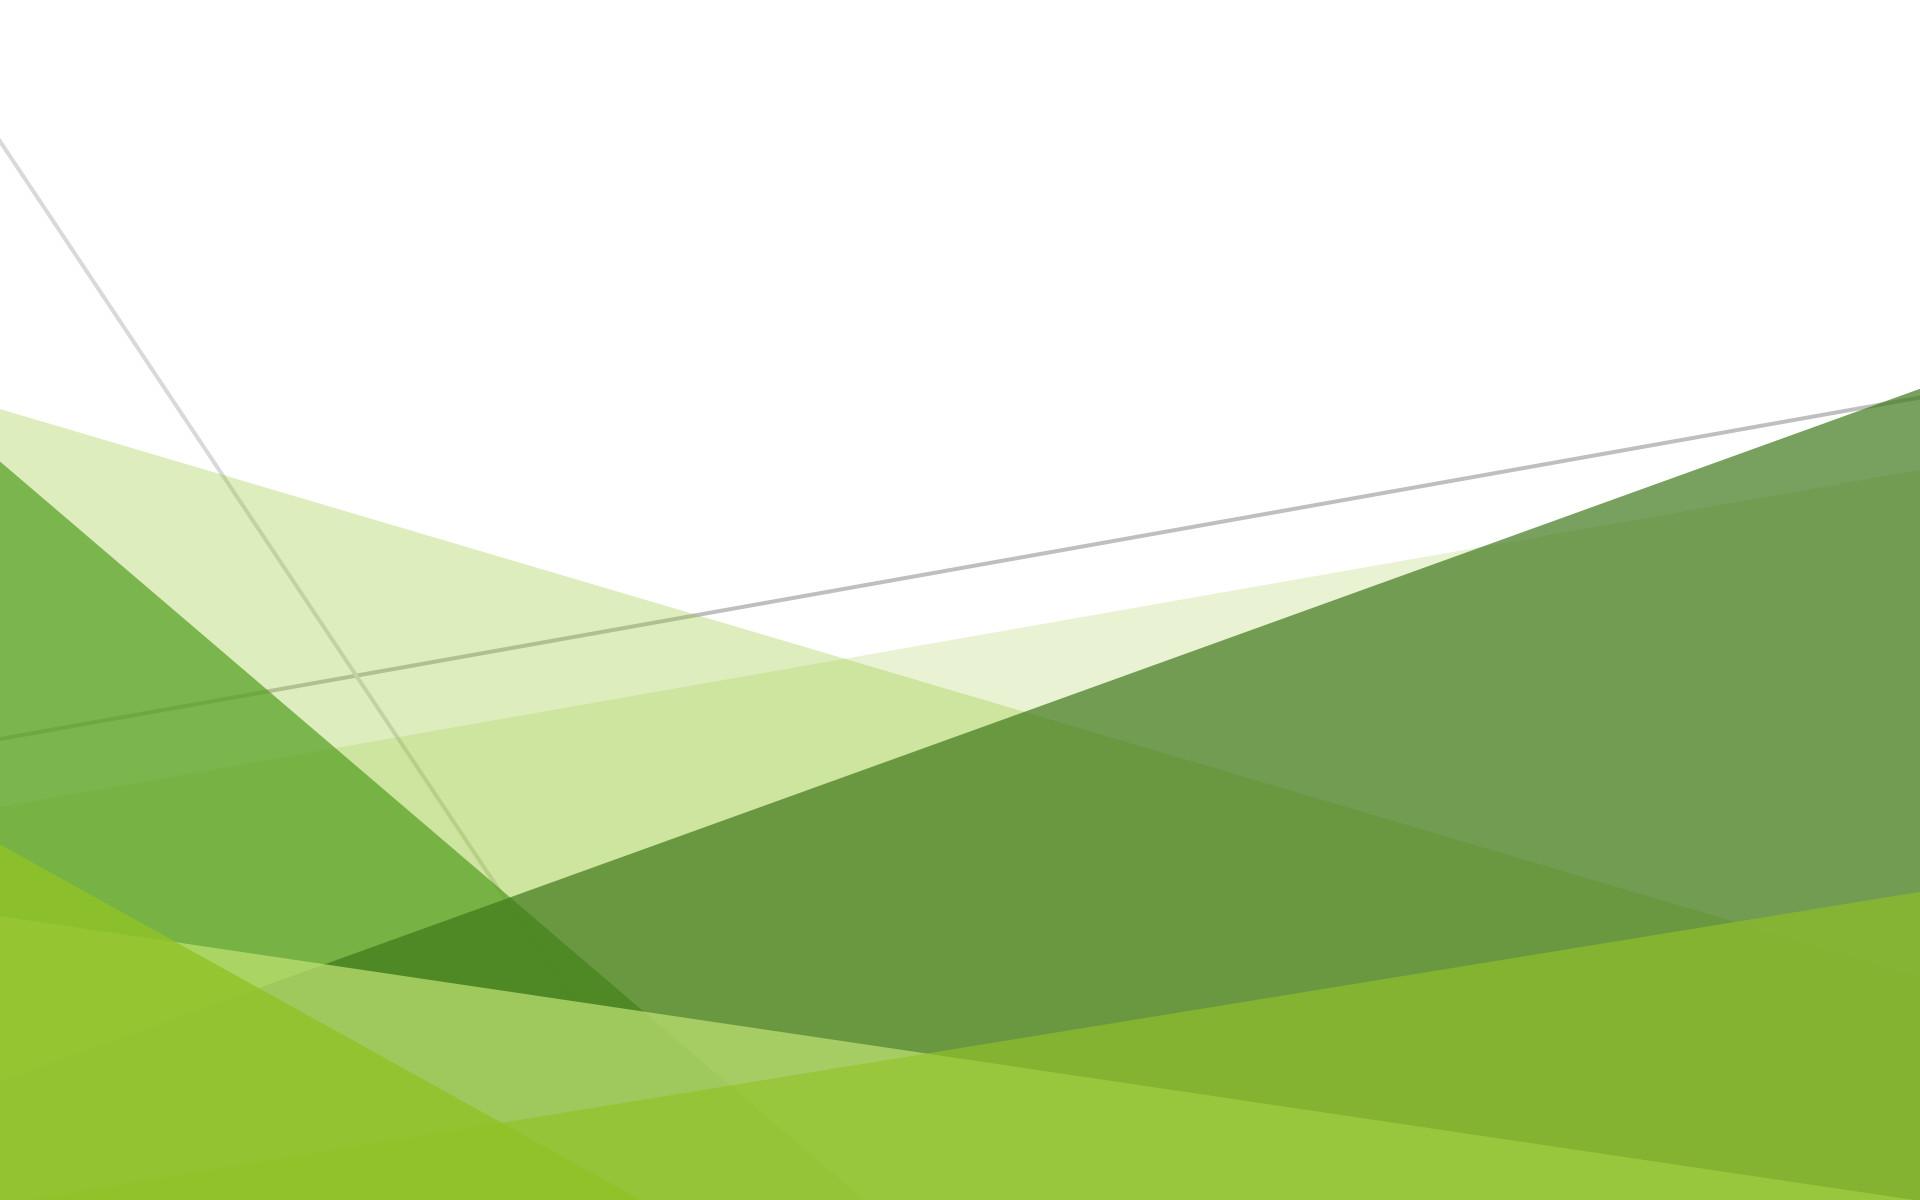 … green swirl wallpaper wallpapersafari …